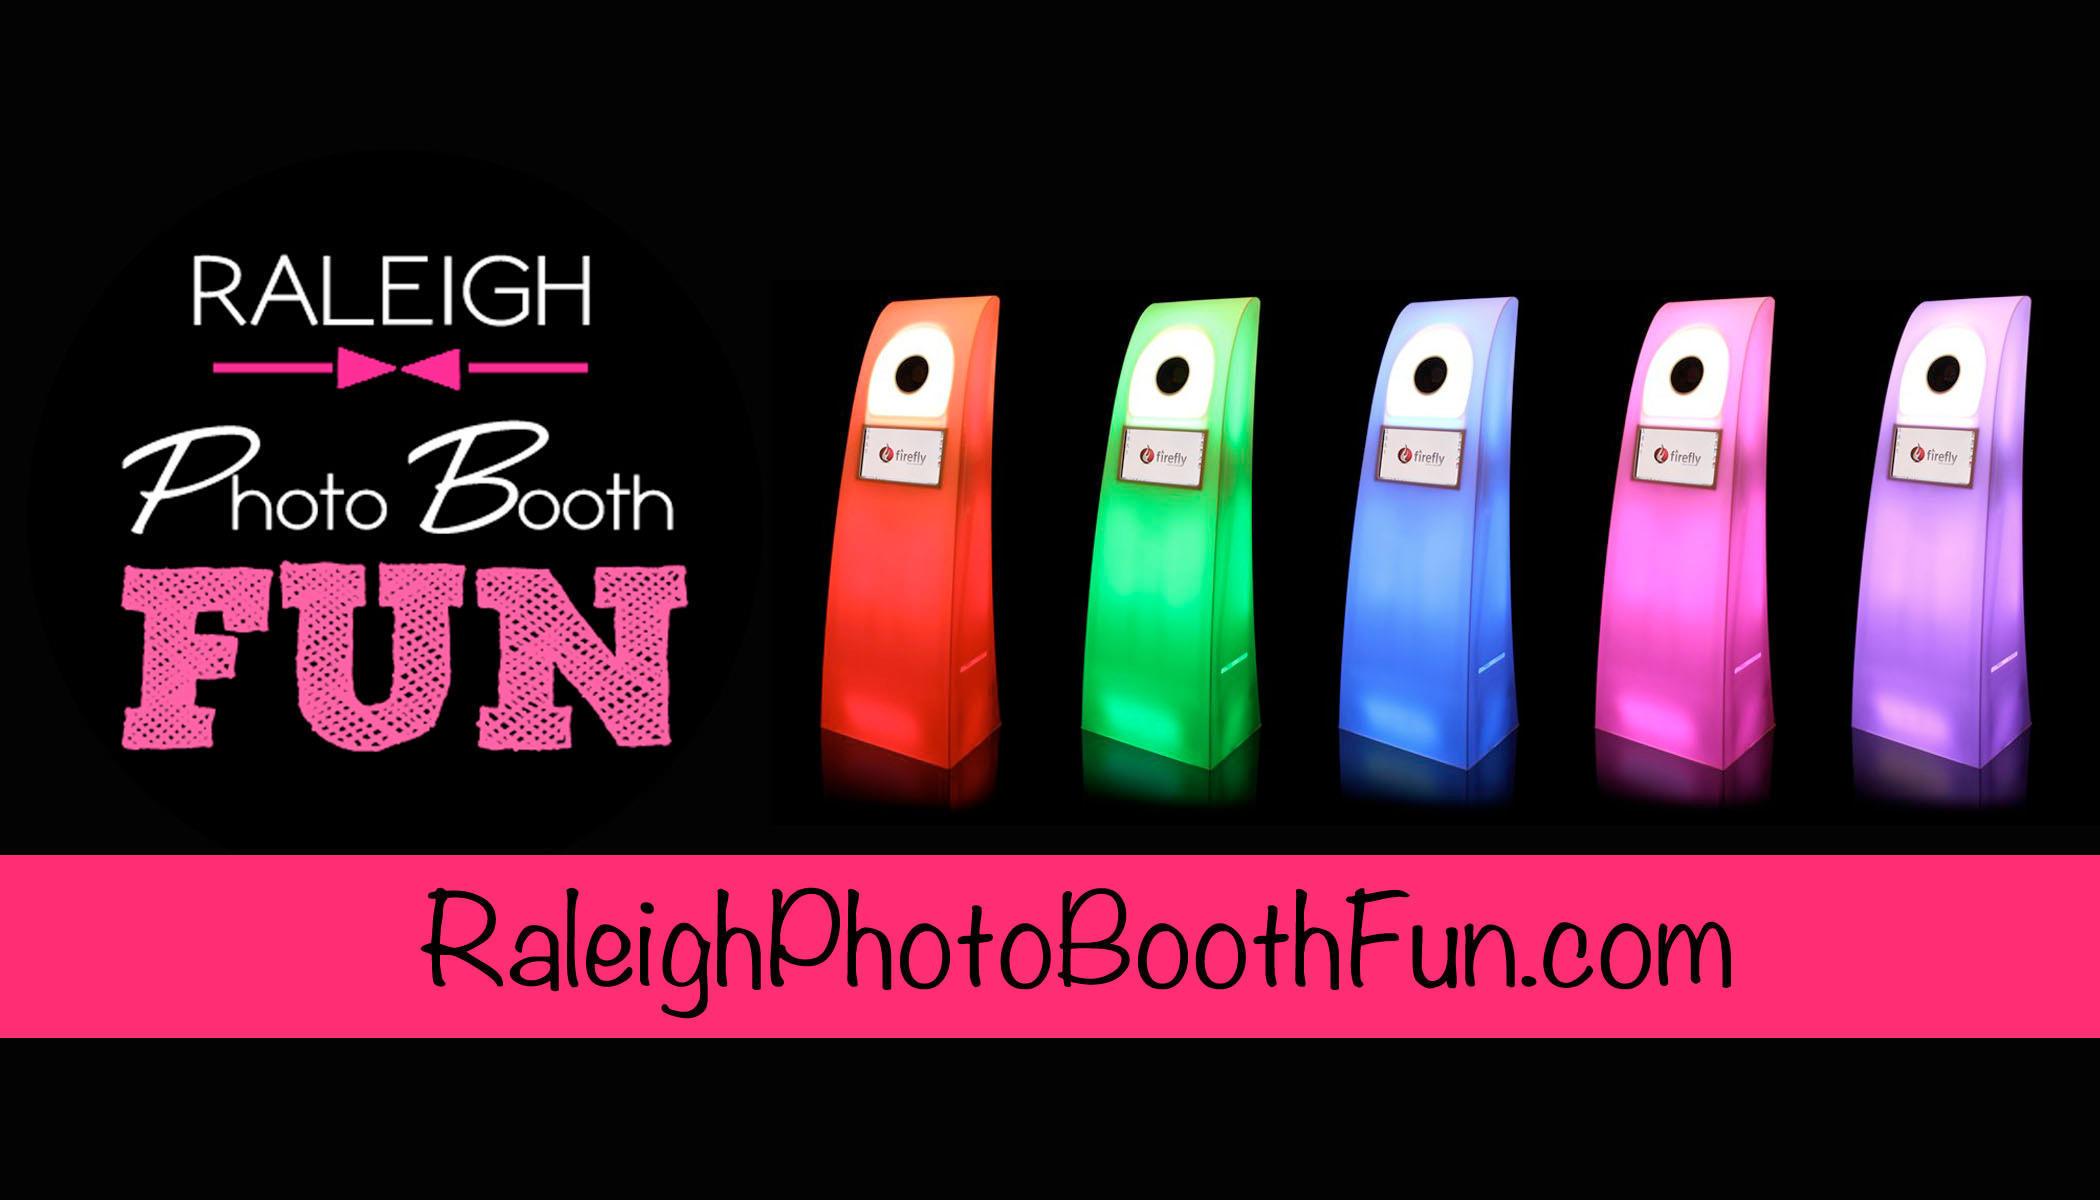 Raleigh Photo Booth Fun image 0